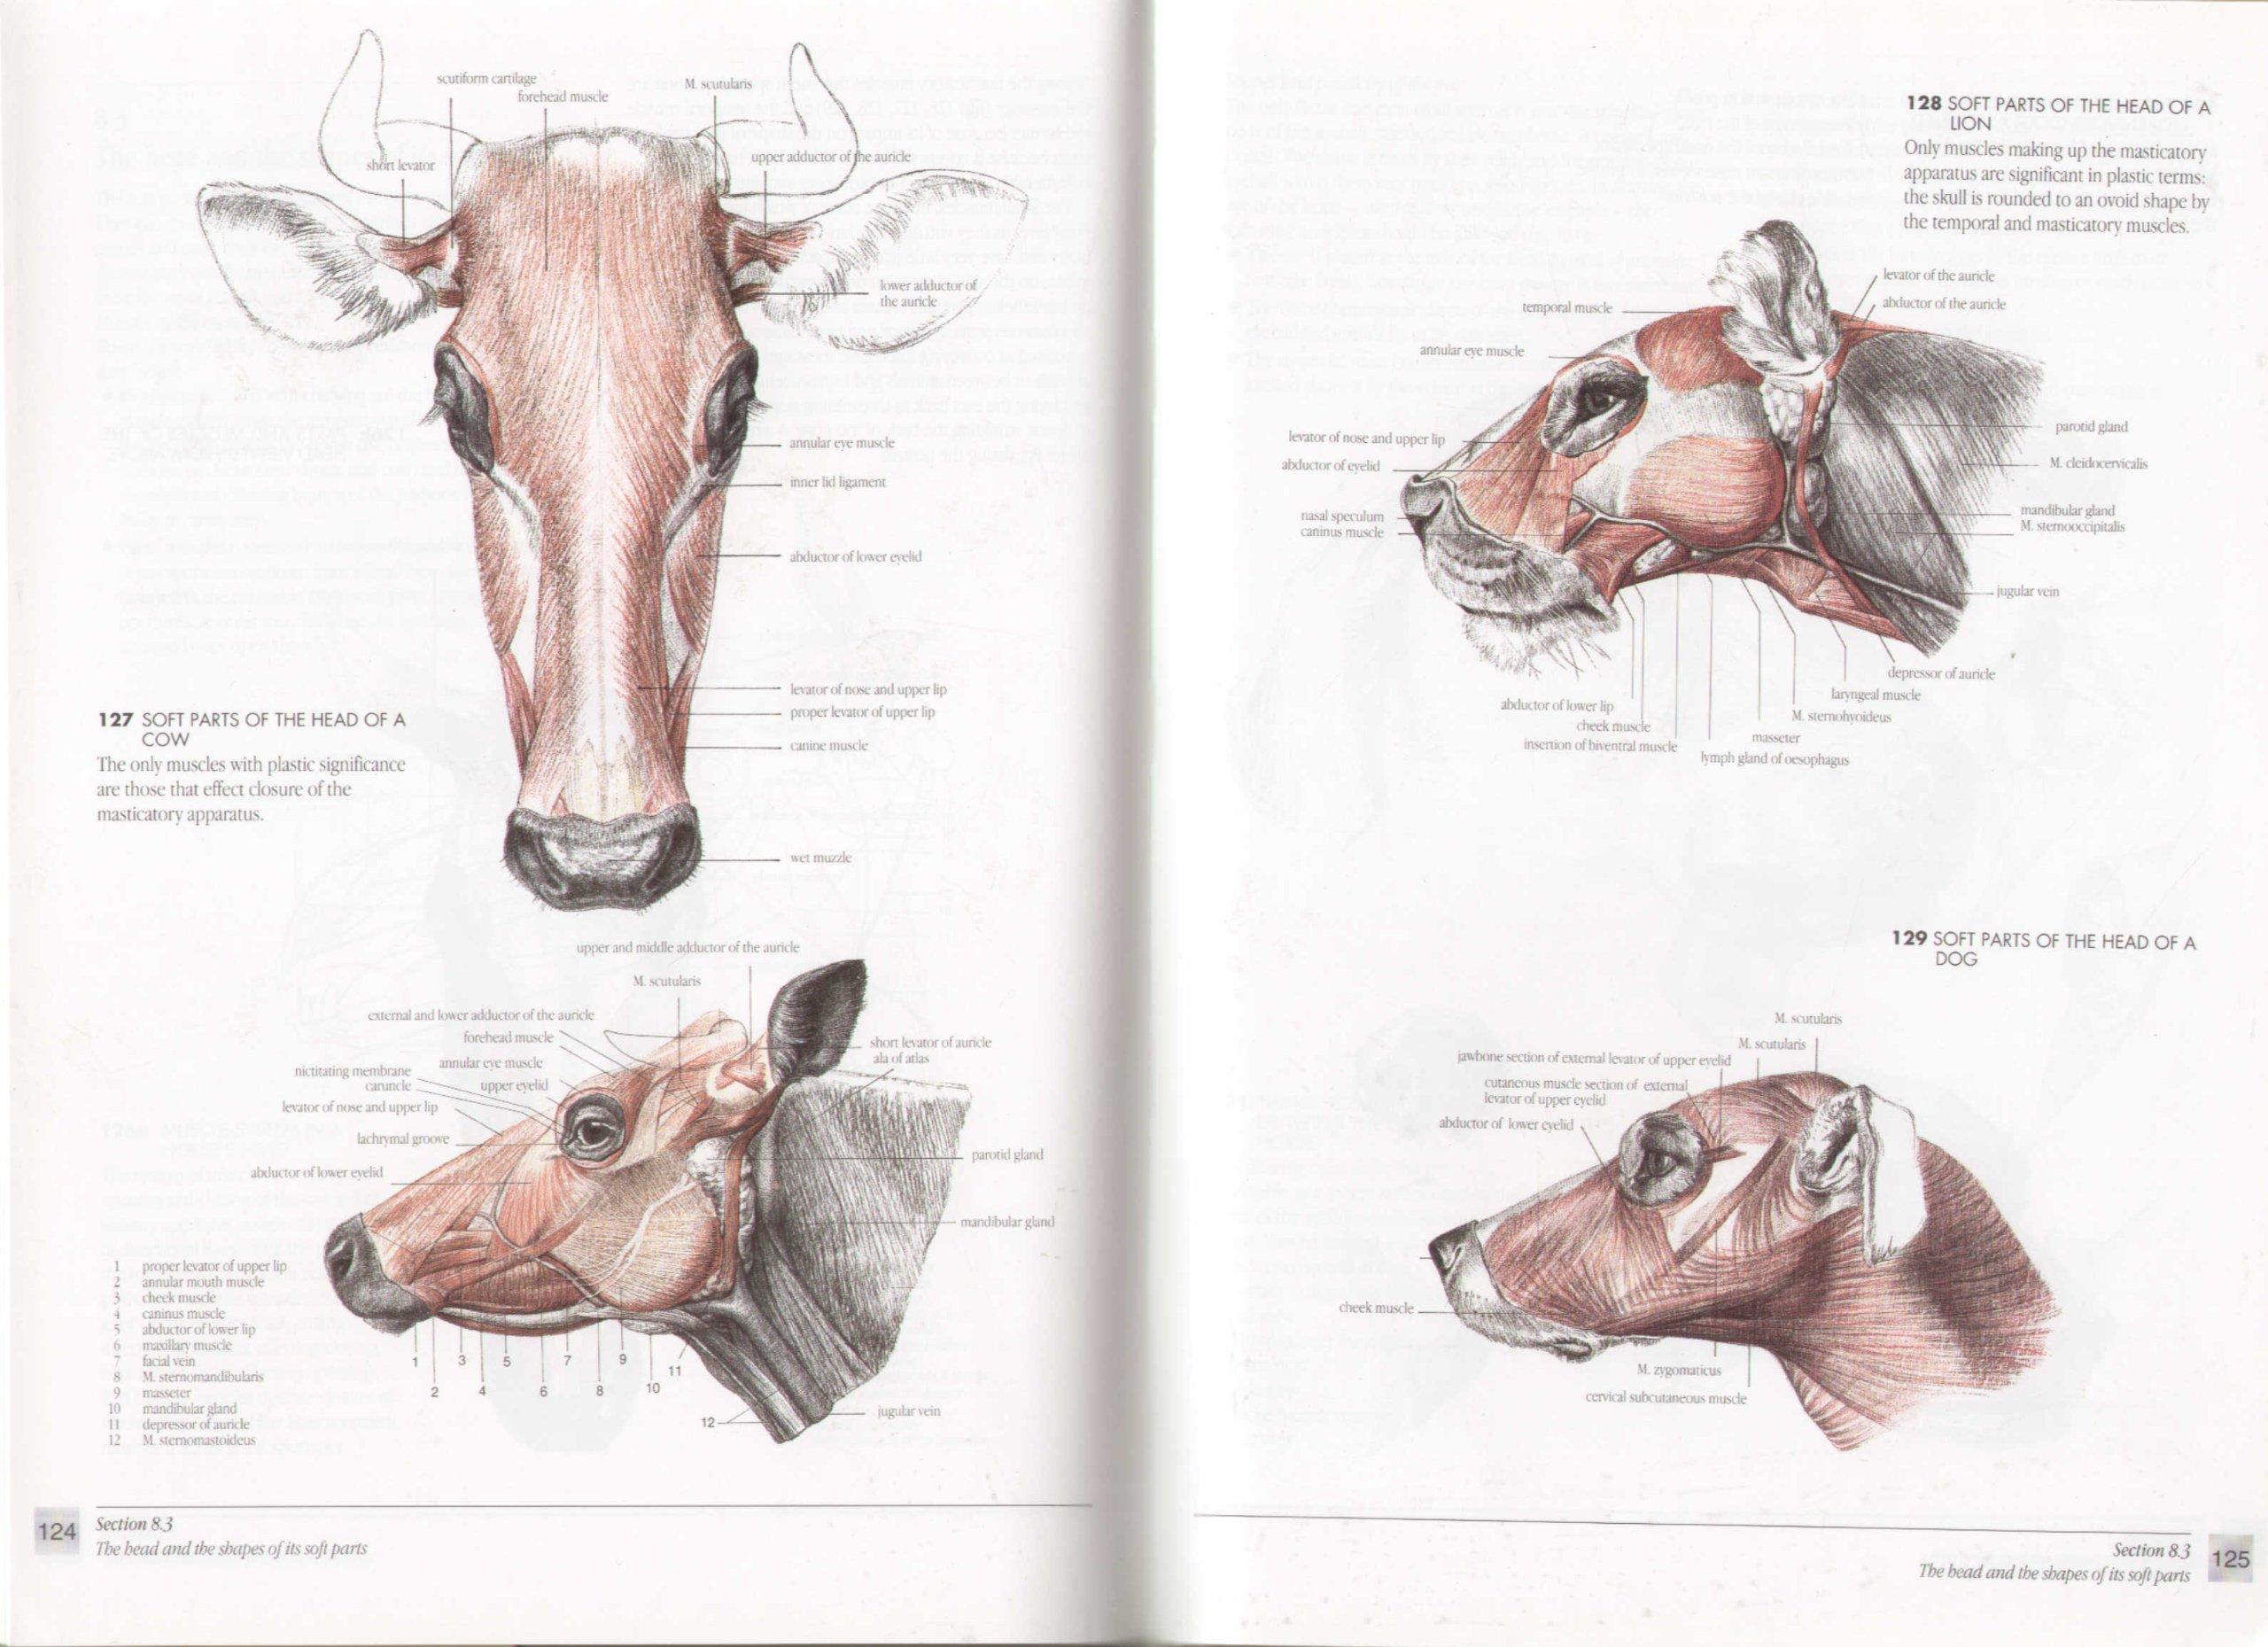 Cow Anatomy Diagram Choice Image - human body anatomy